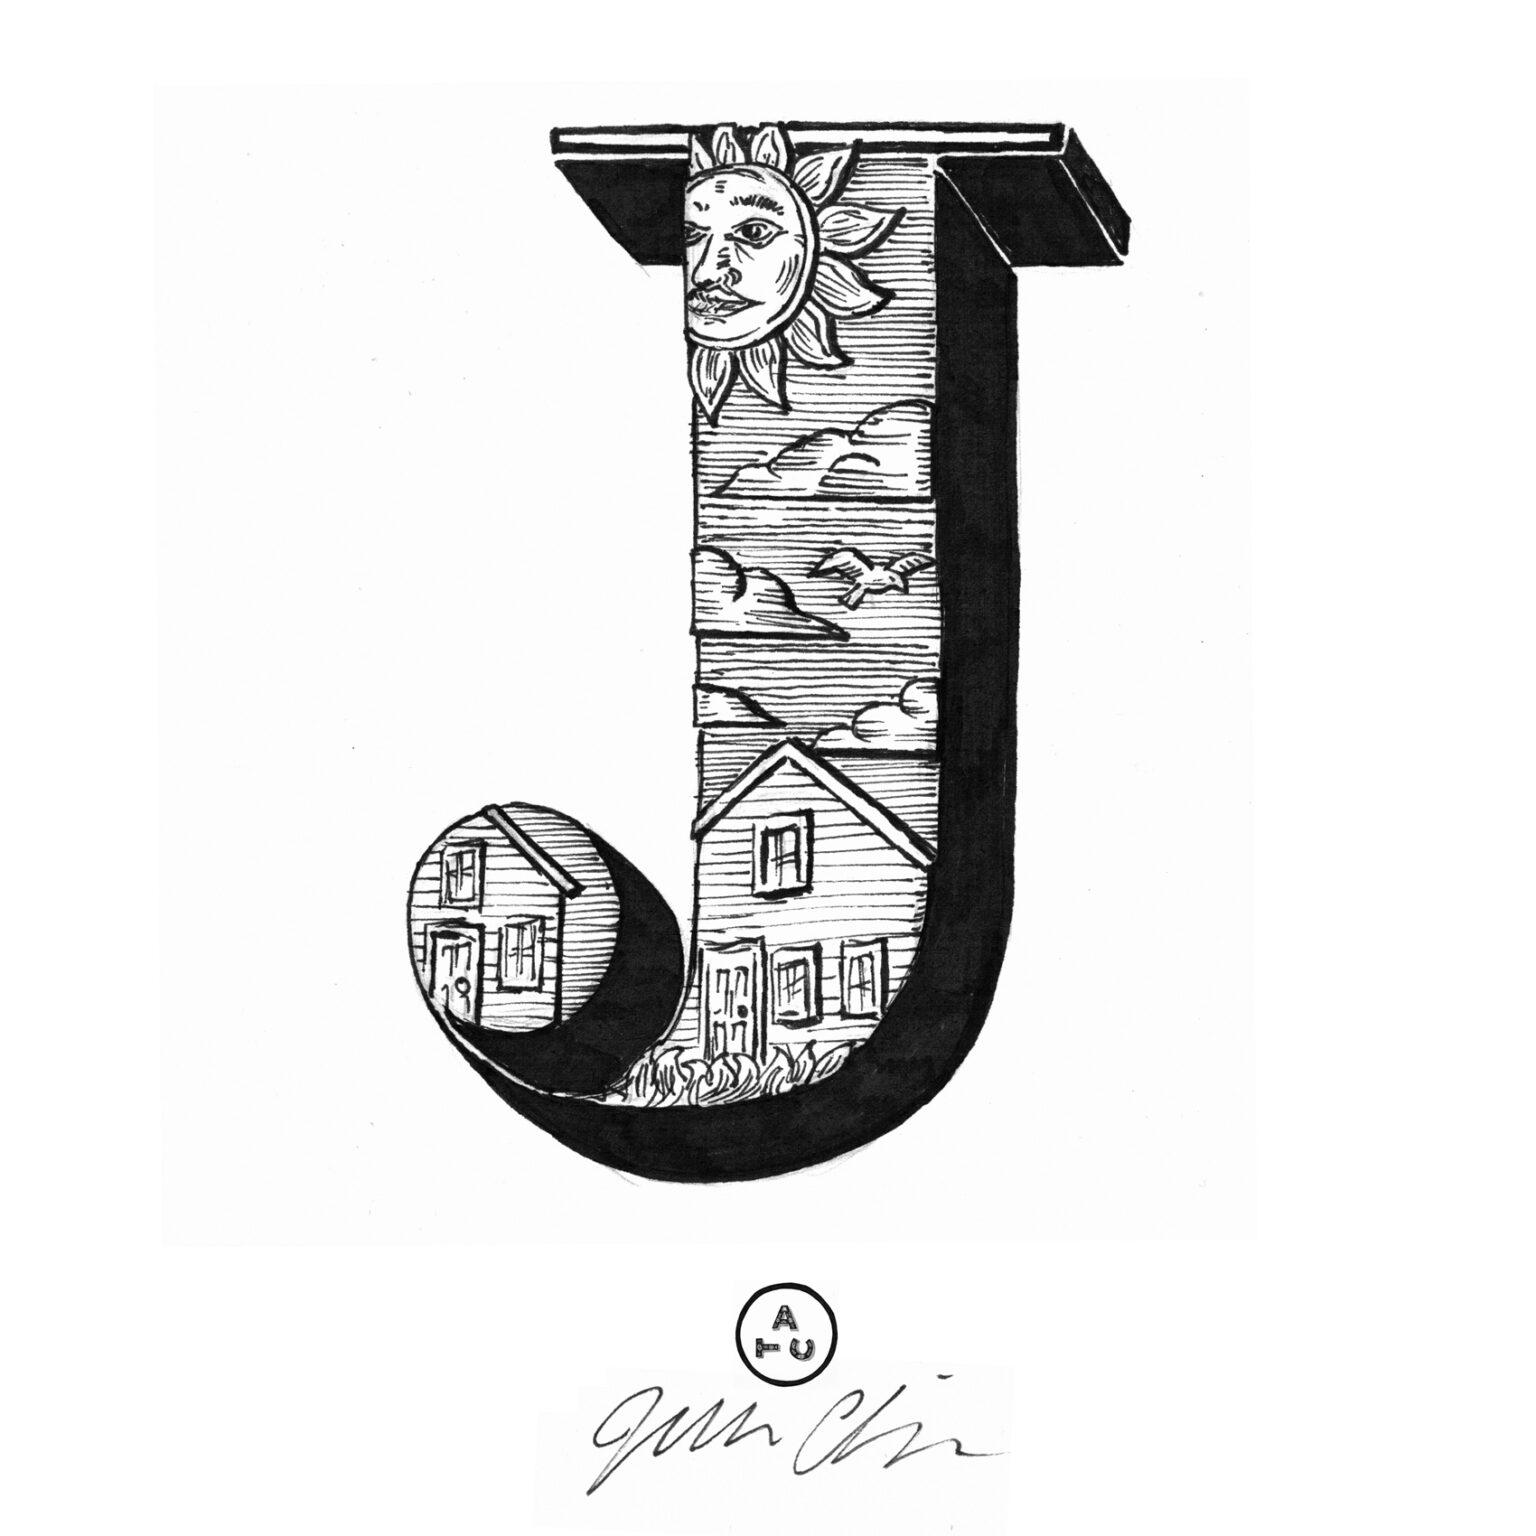 ATC Artist Series Joseph Alessio Letter J